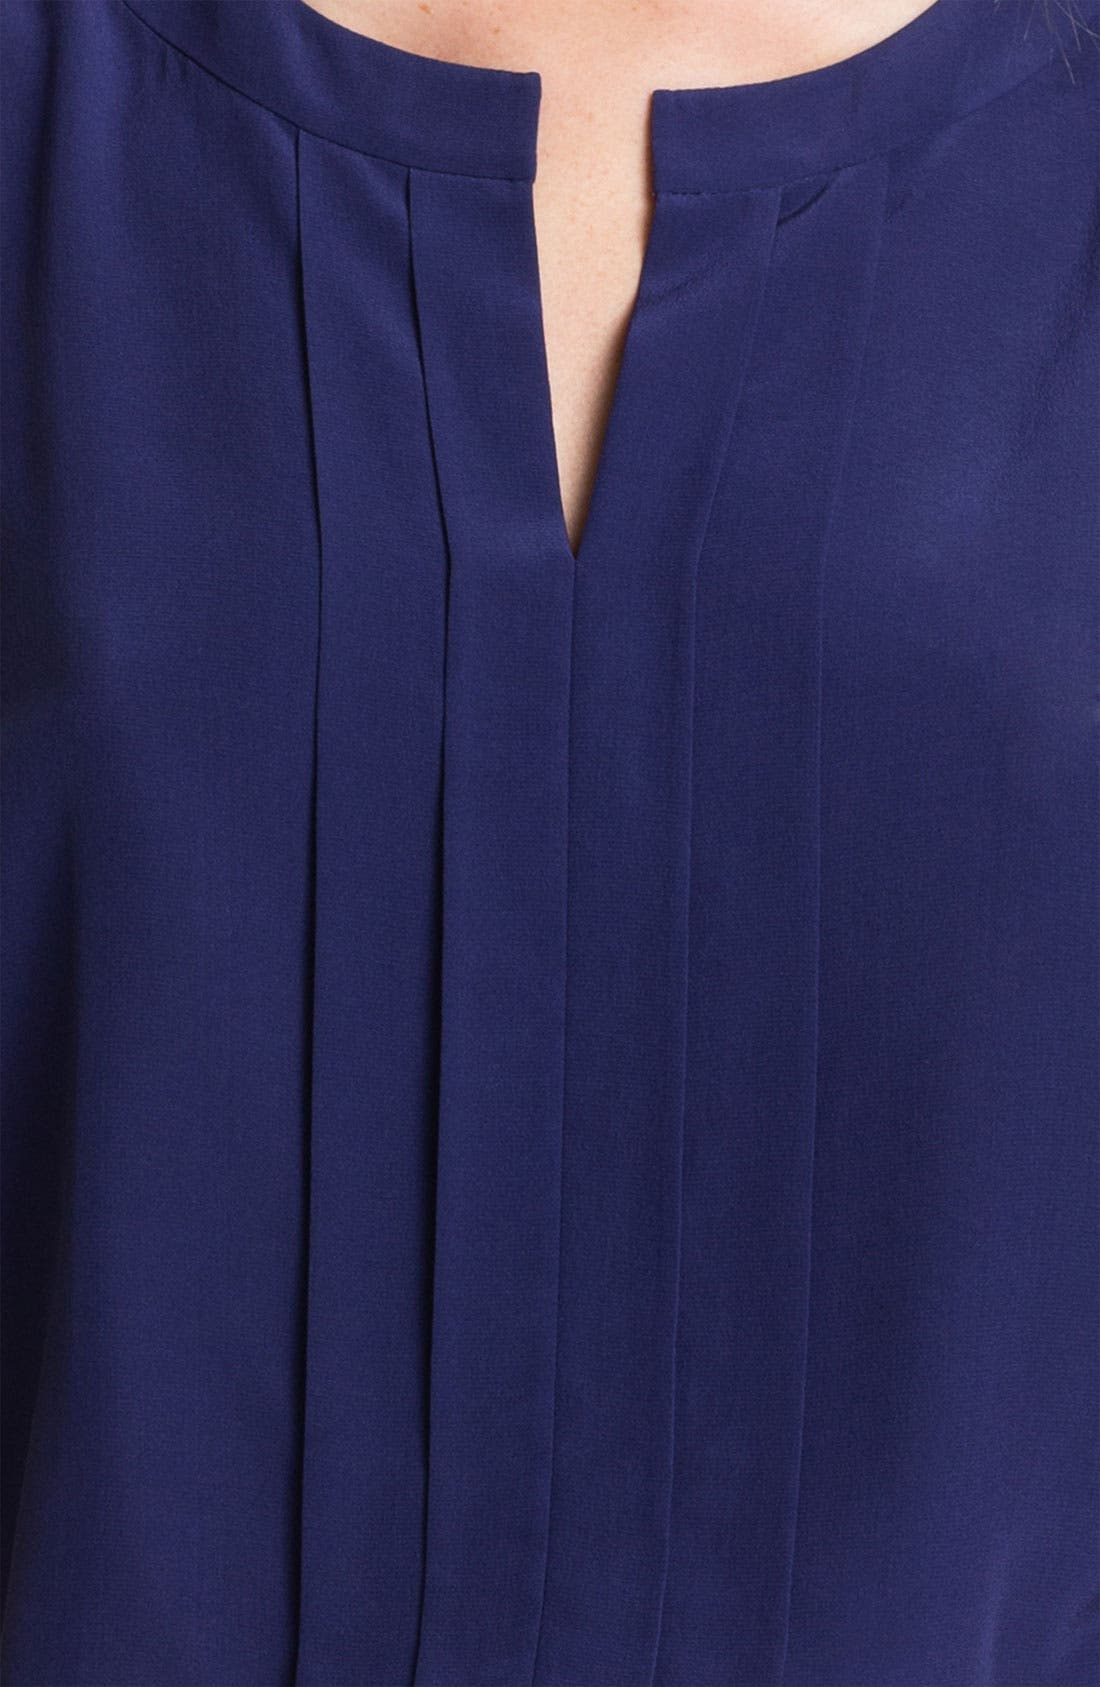 Alternate Image 3  - kate spade new york 'addie' silk blouse